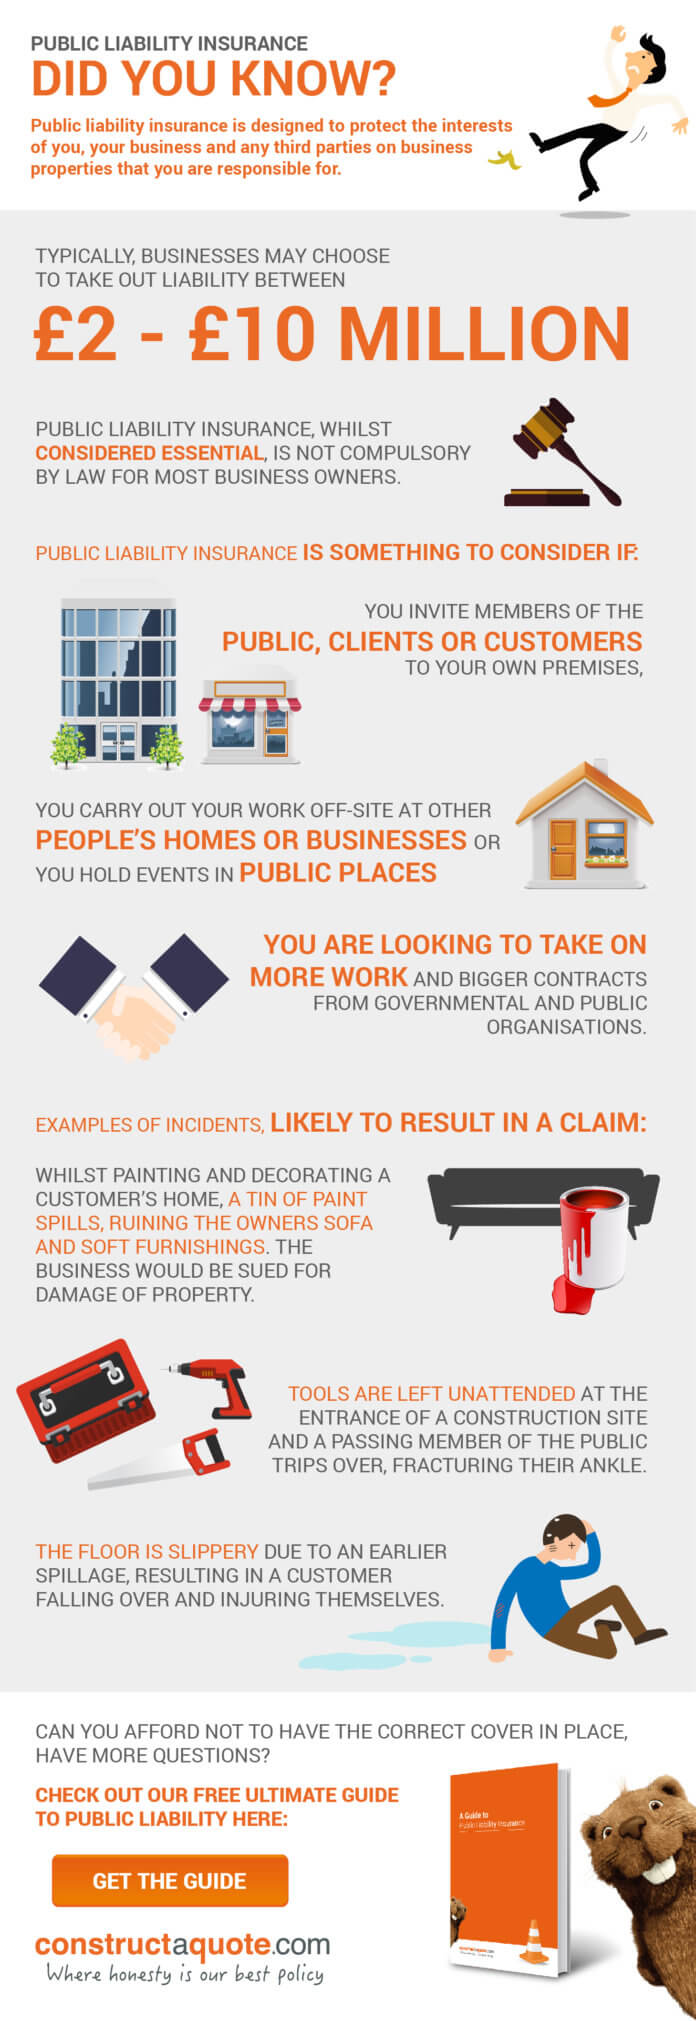 Public liability insurance infographic constructaquote.com